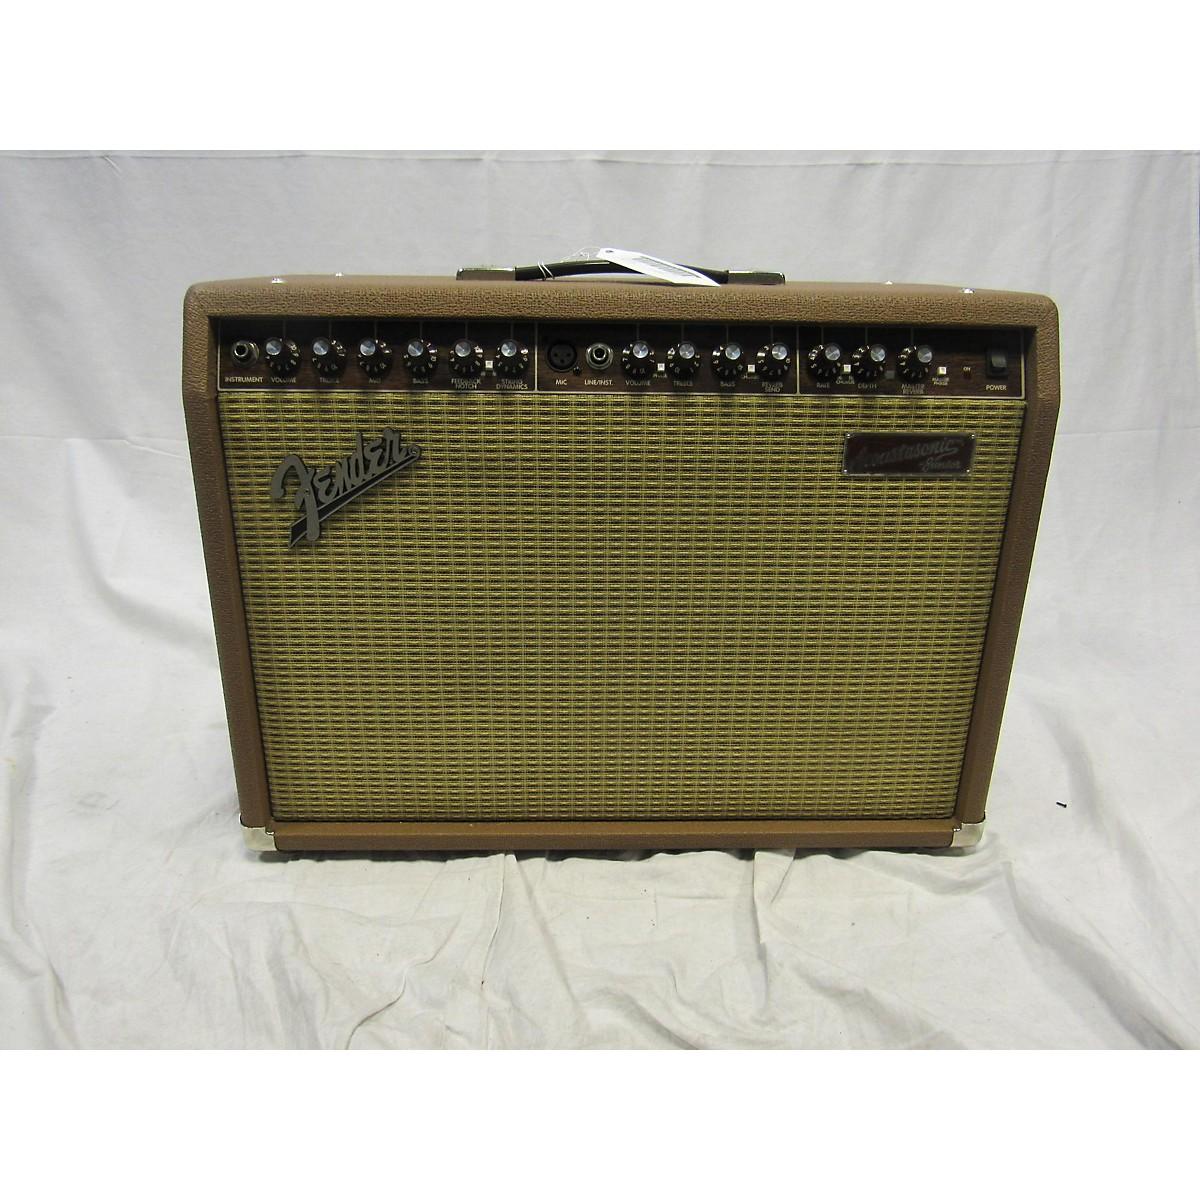 Fender Acoustasonic Jr Dsp 80W Acoustic Guitar Combo Amp